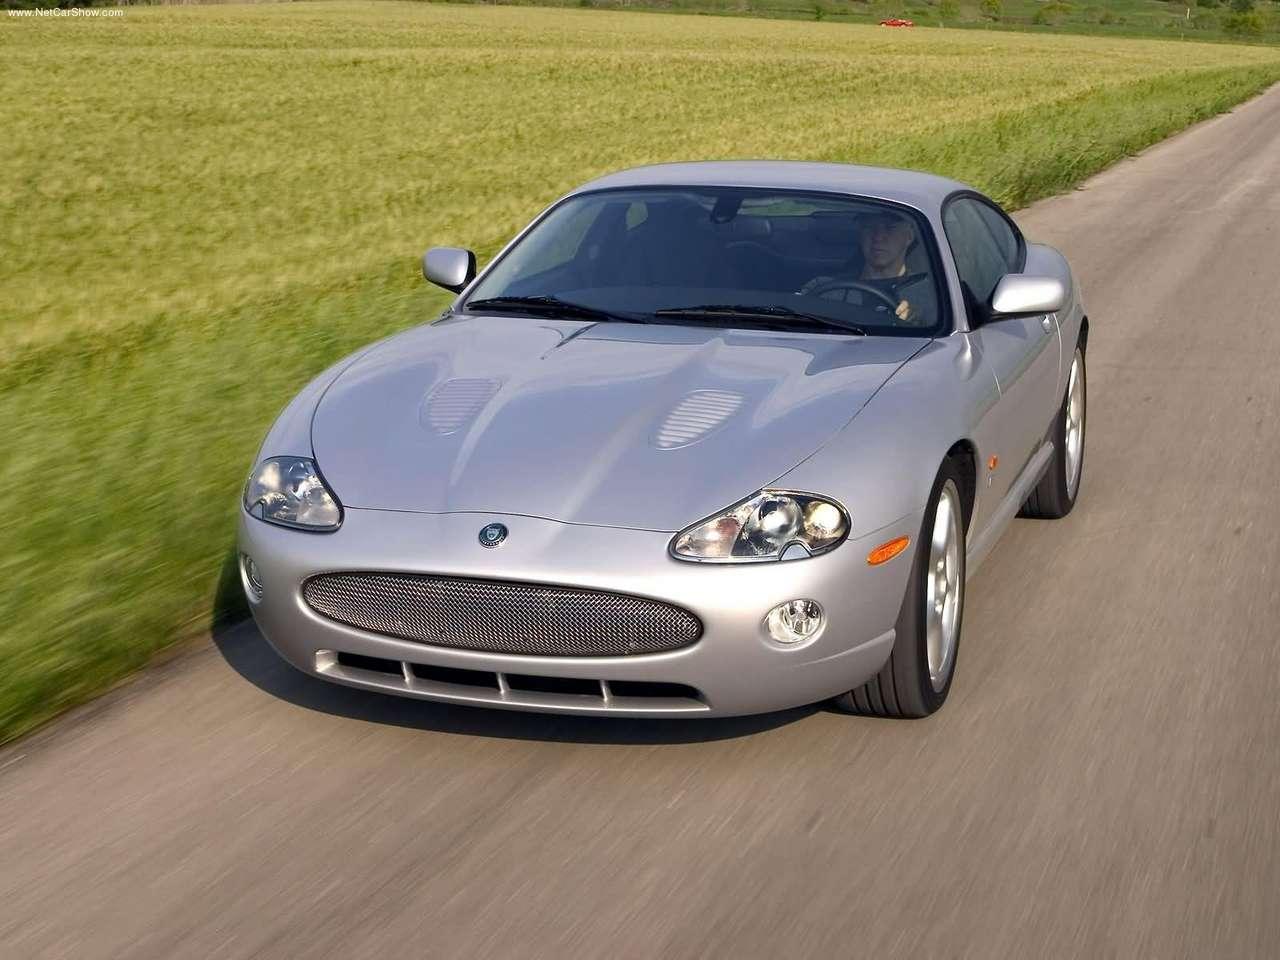 http://2.bp.blogspot.com/-J_6RTDSkThY/TZMgS1fFy1I/AAAAAAAACLc/gBFcoobh-qI/s1600/Jaguar-XKR_Coupe_2005_1280x960_wallpaper_04.jpg